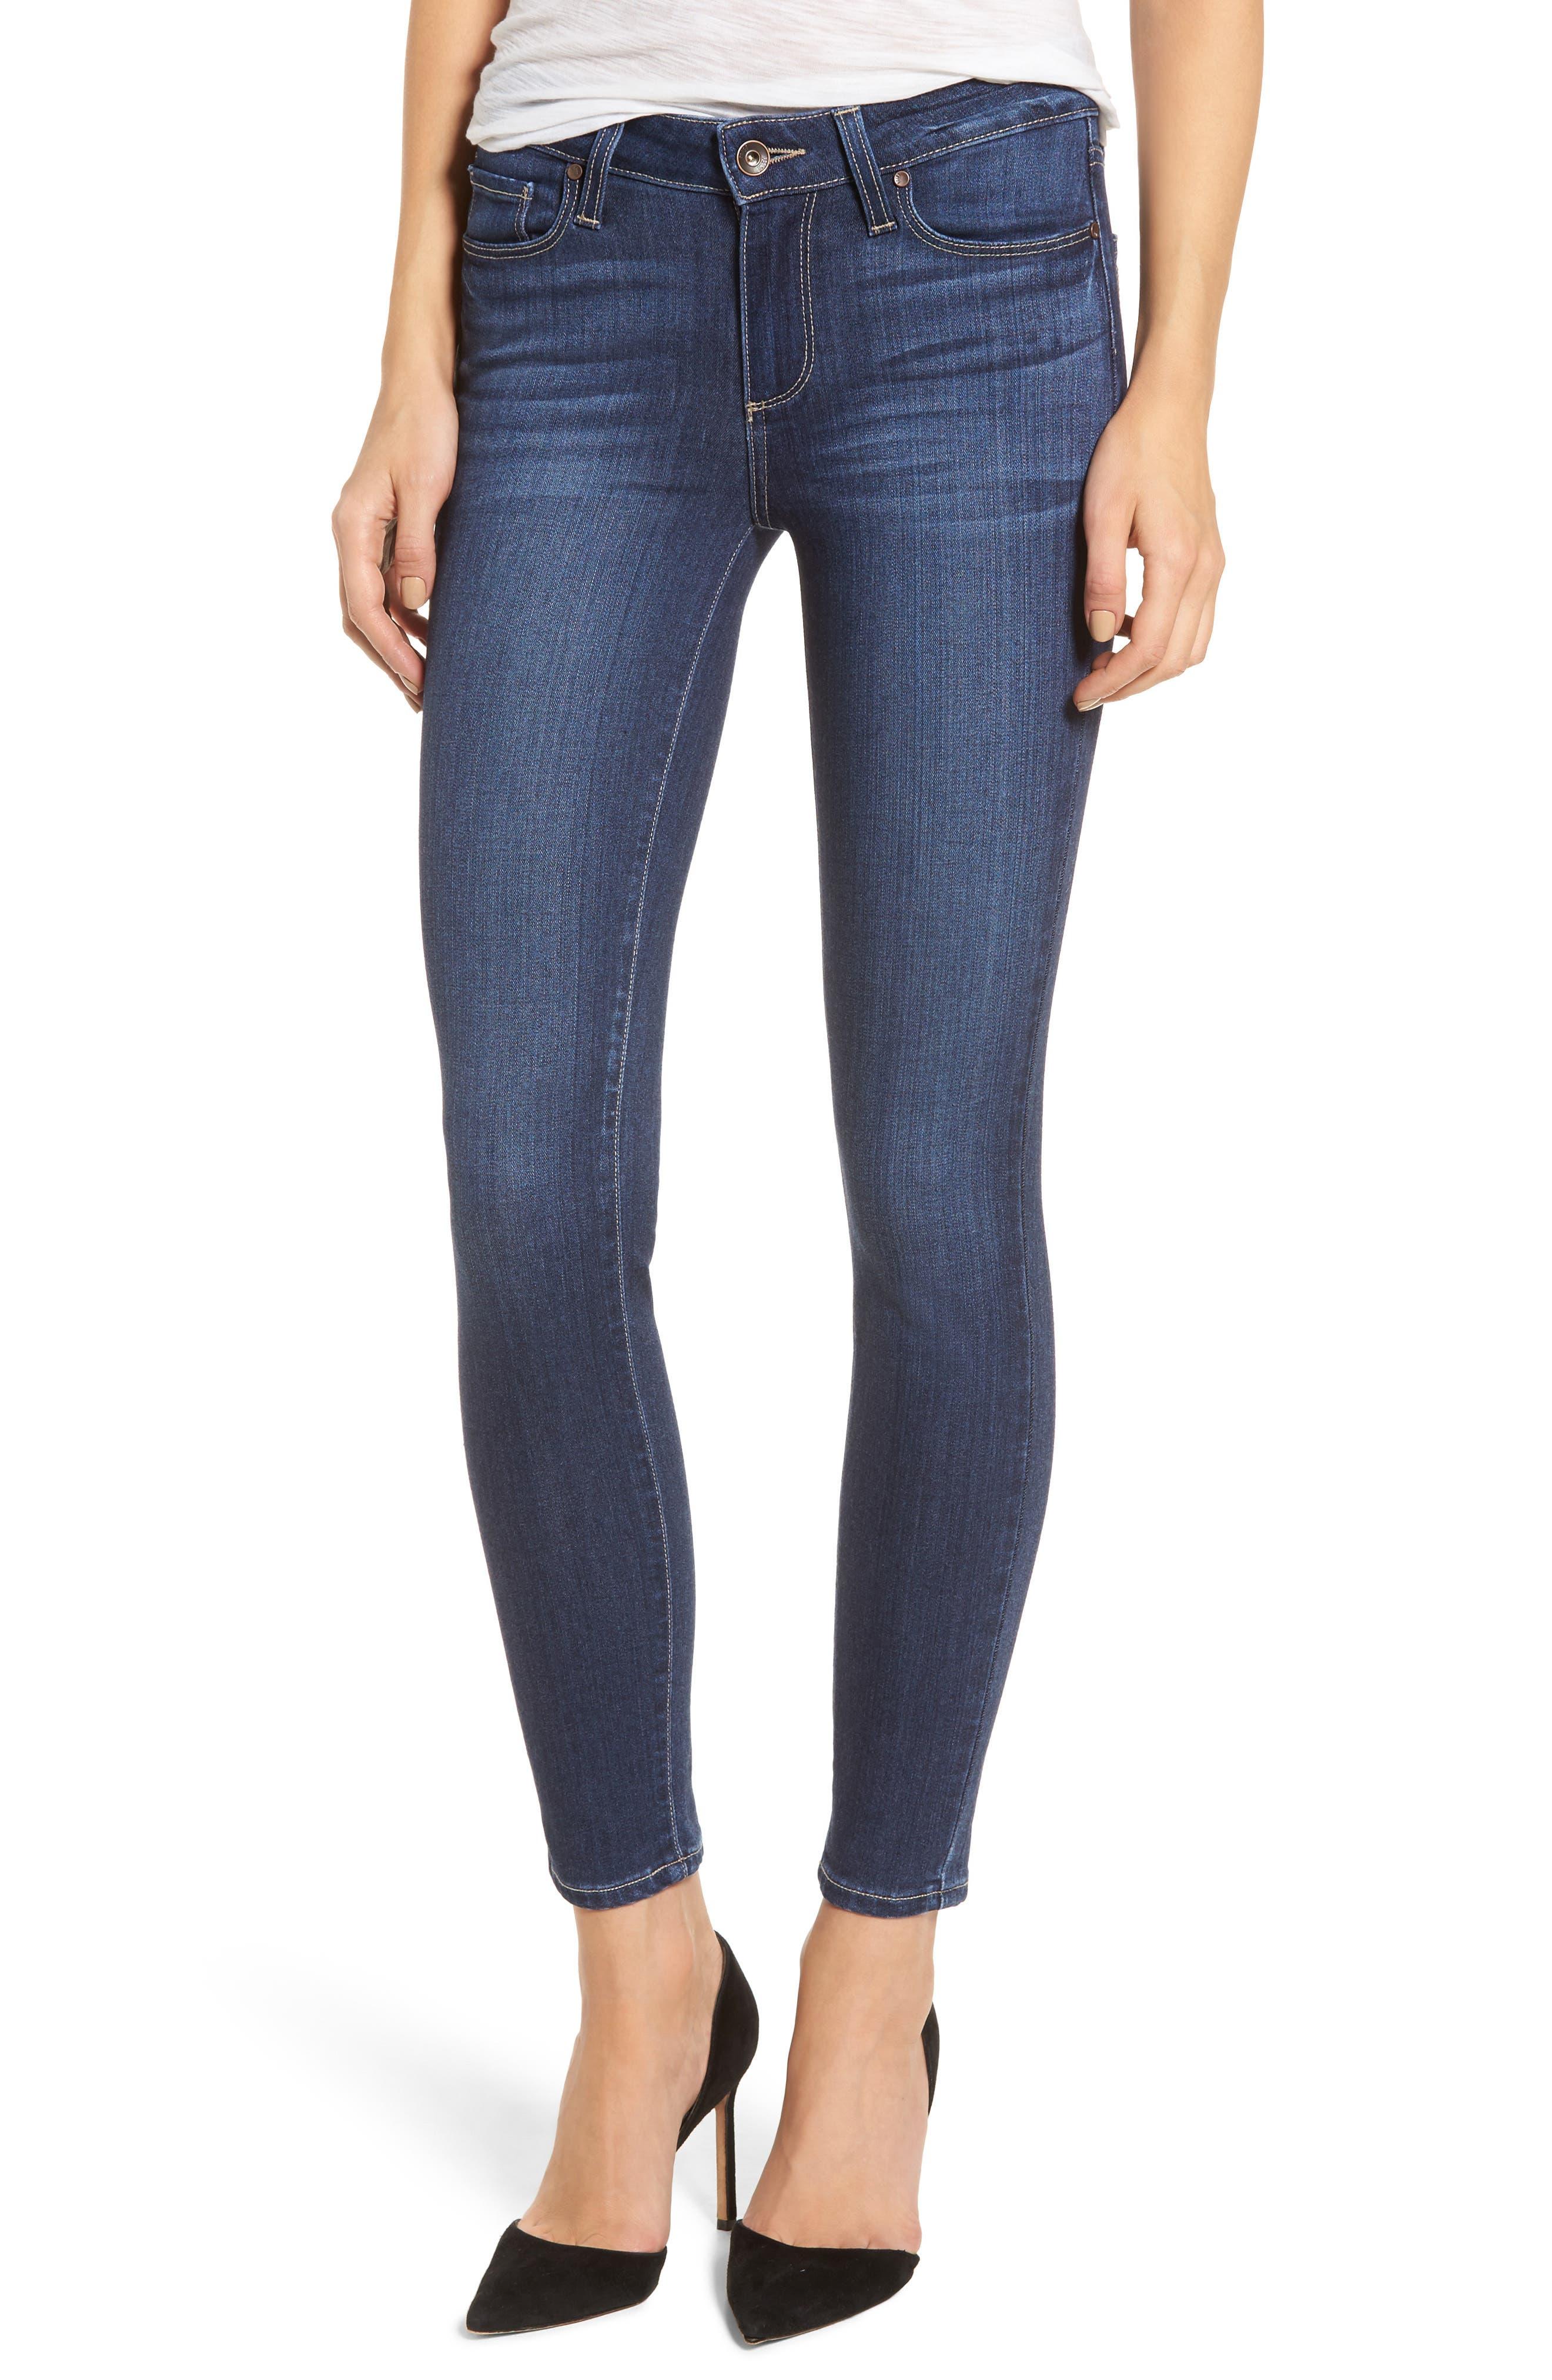 Transcend - Verdugo Ankle Skinny Jeans,                             Main thumbnail 1, color,                             Blue